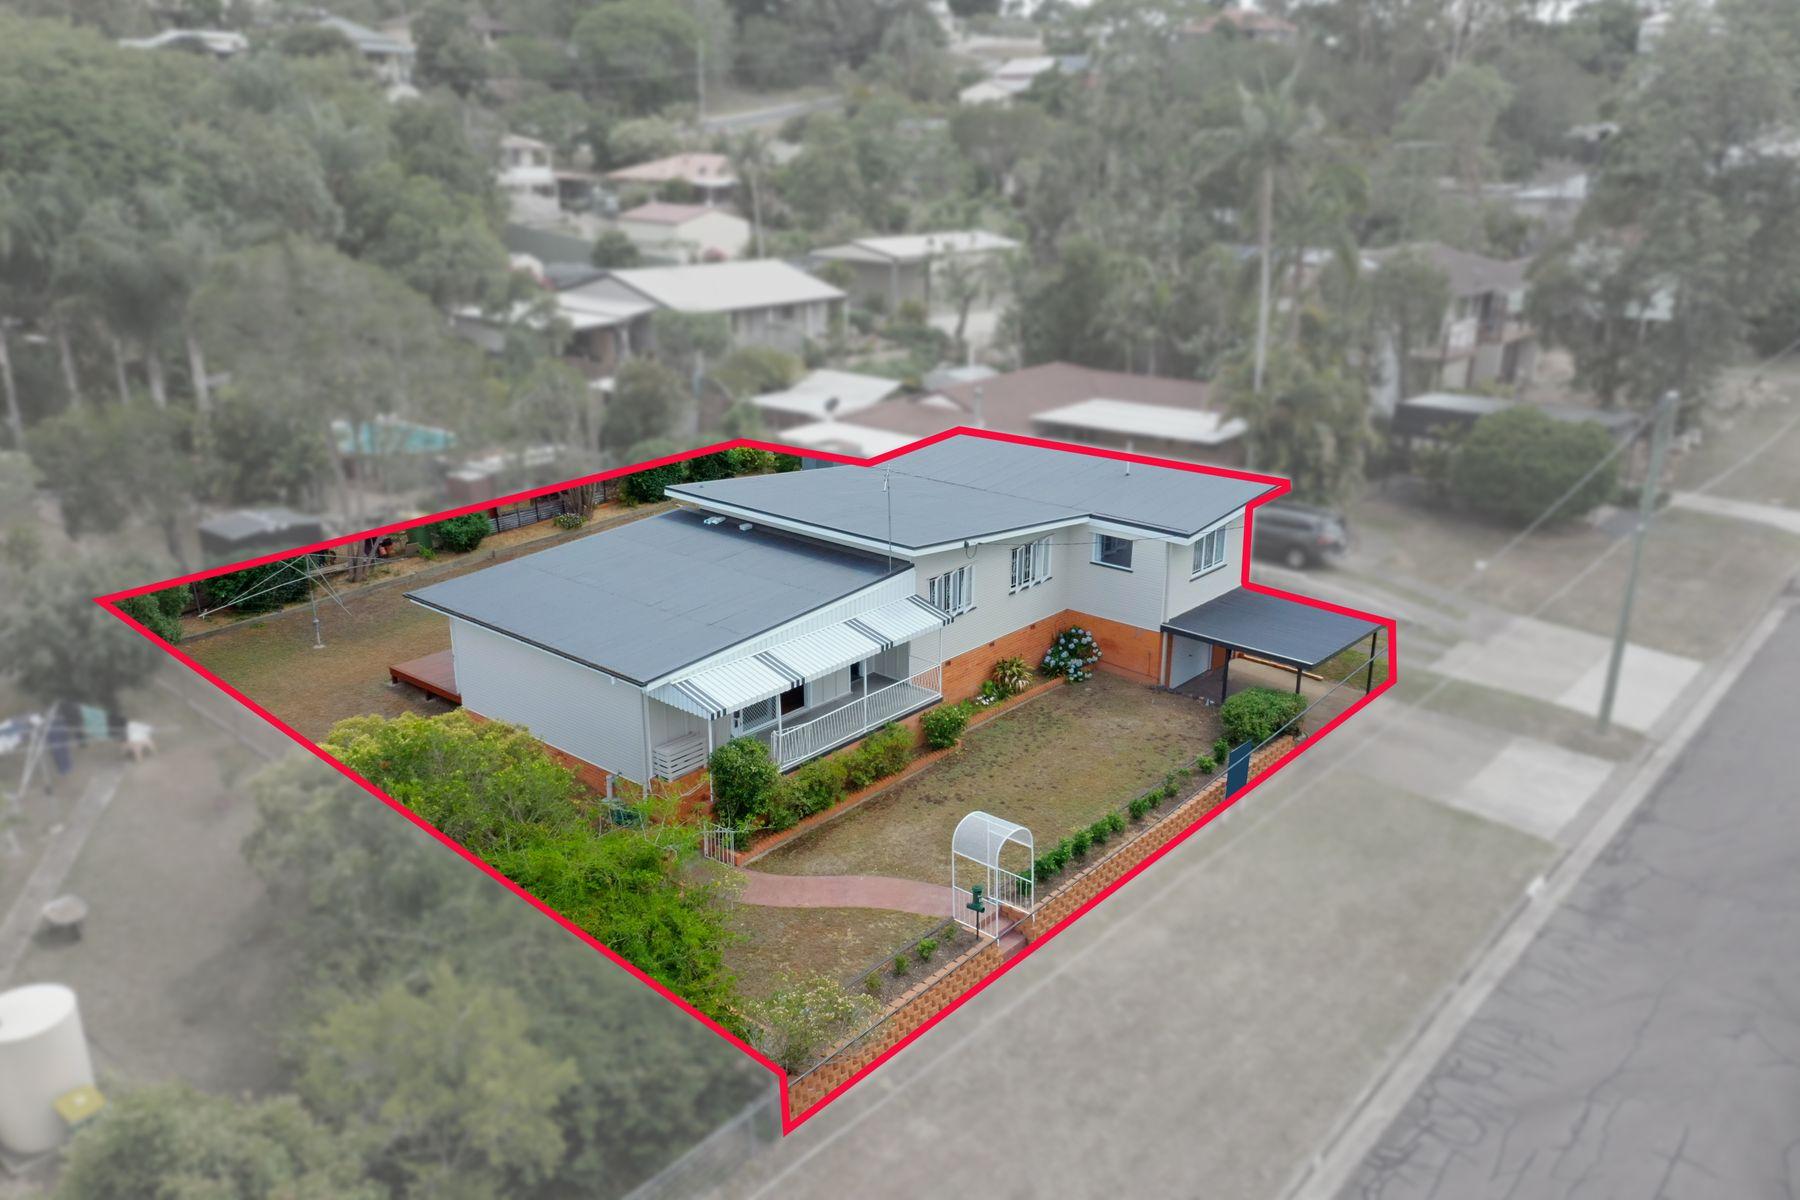 17 Chamberlain Street, Sadliers Crossing, QLD 4305